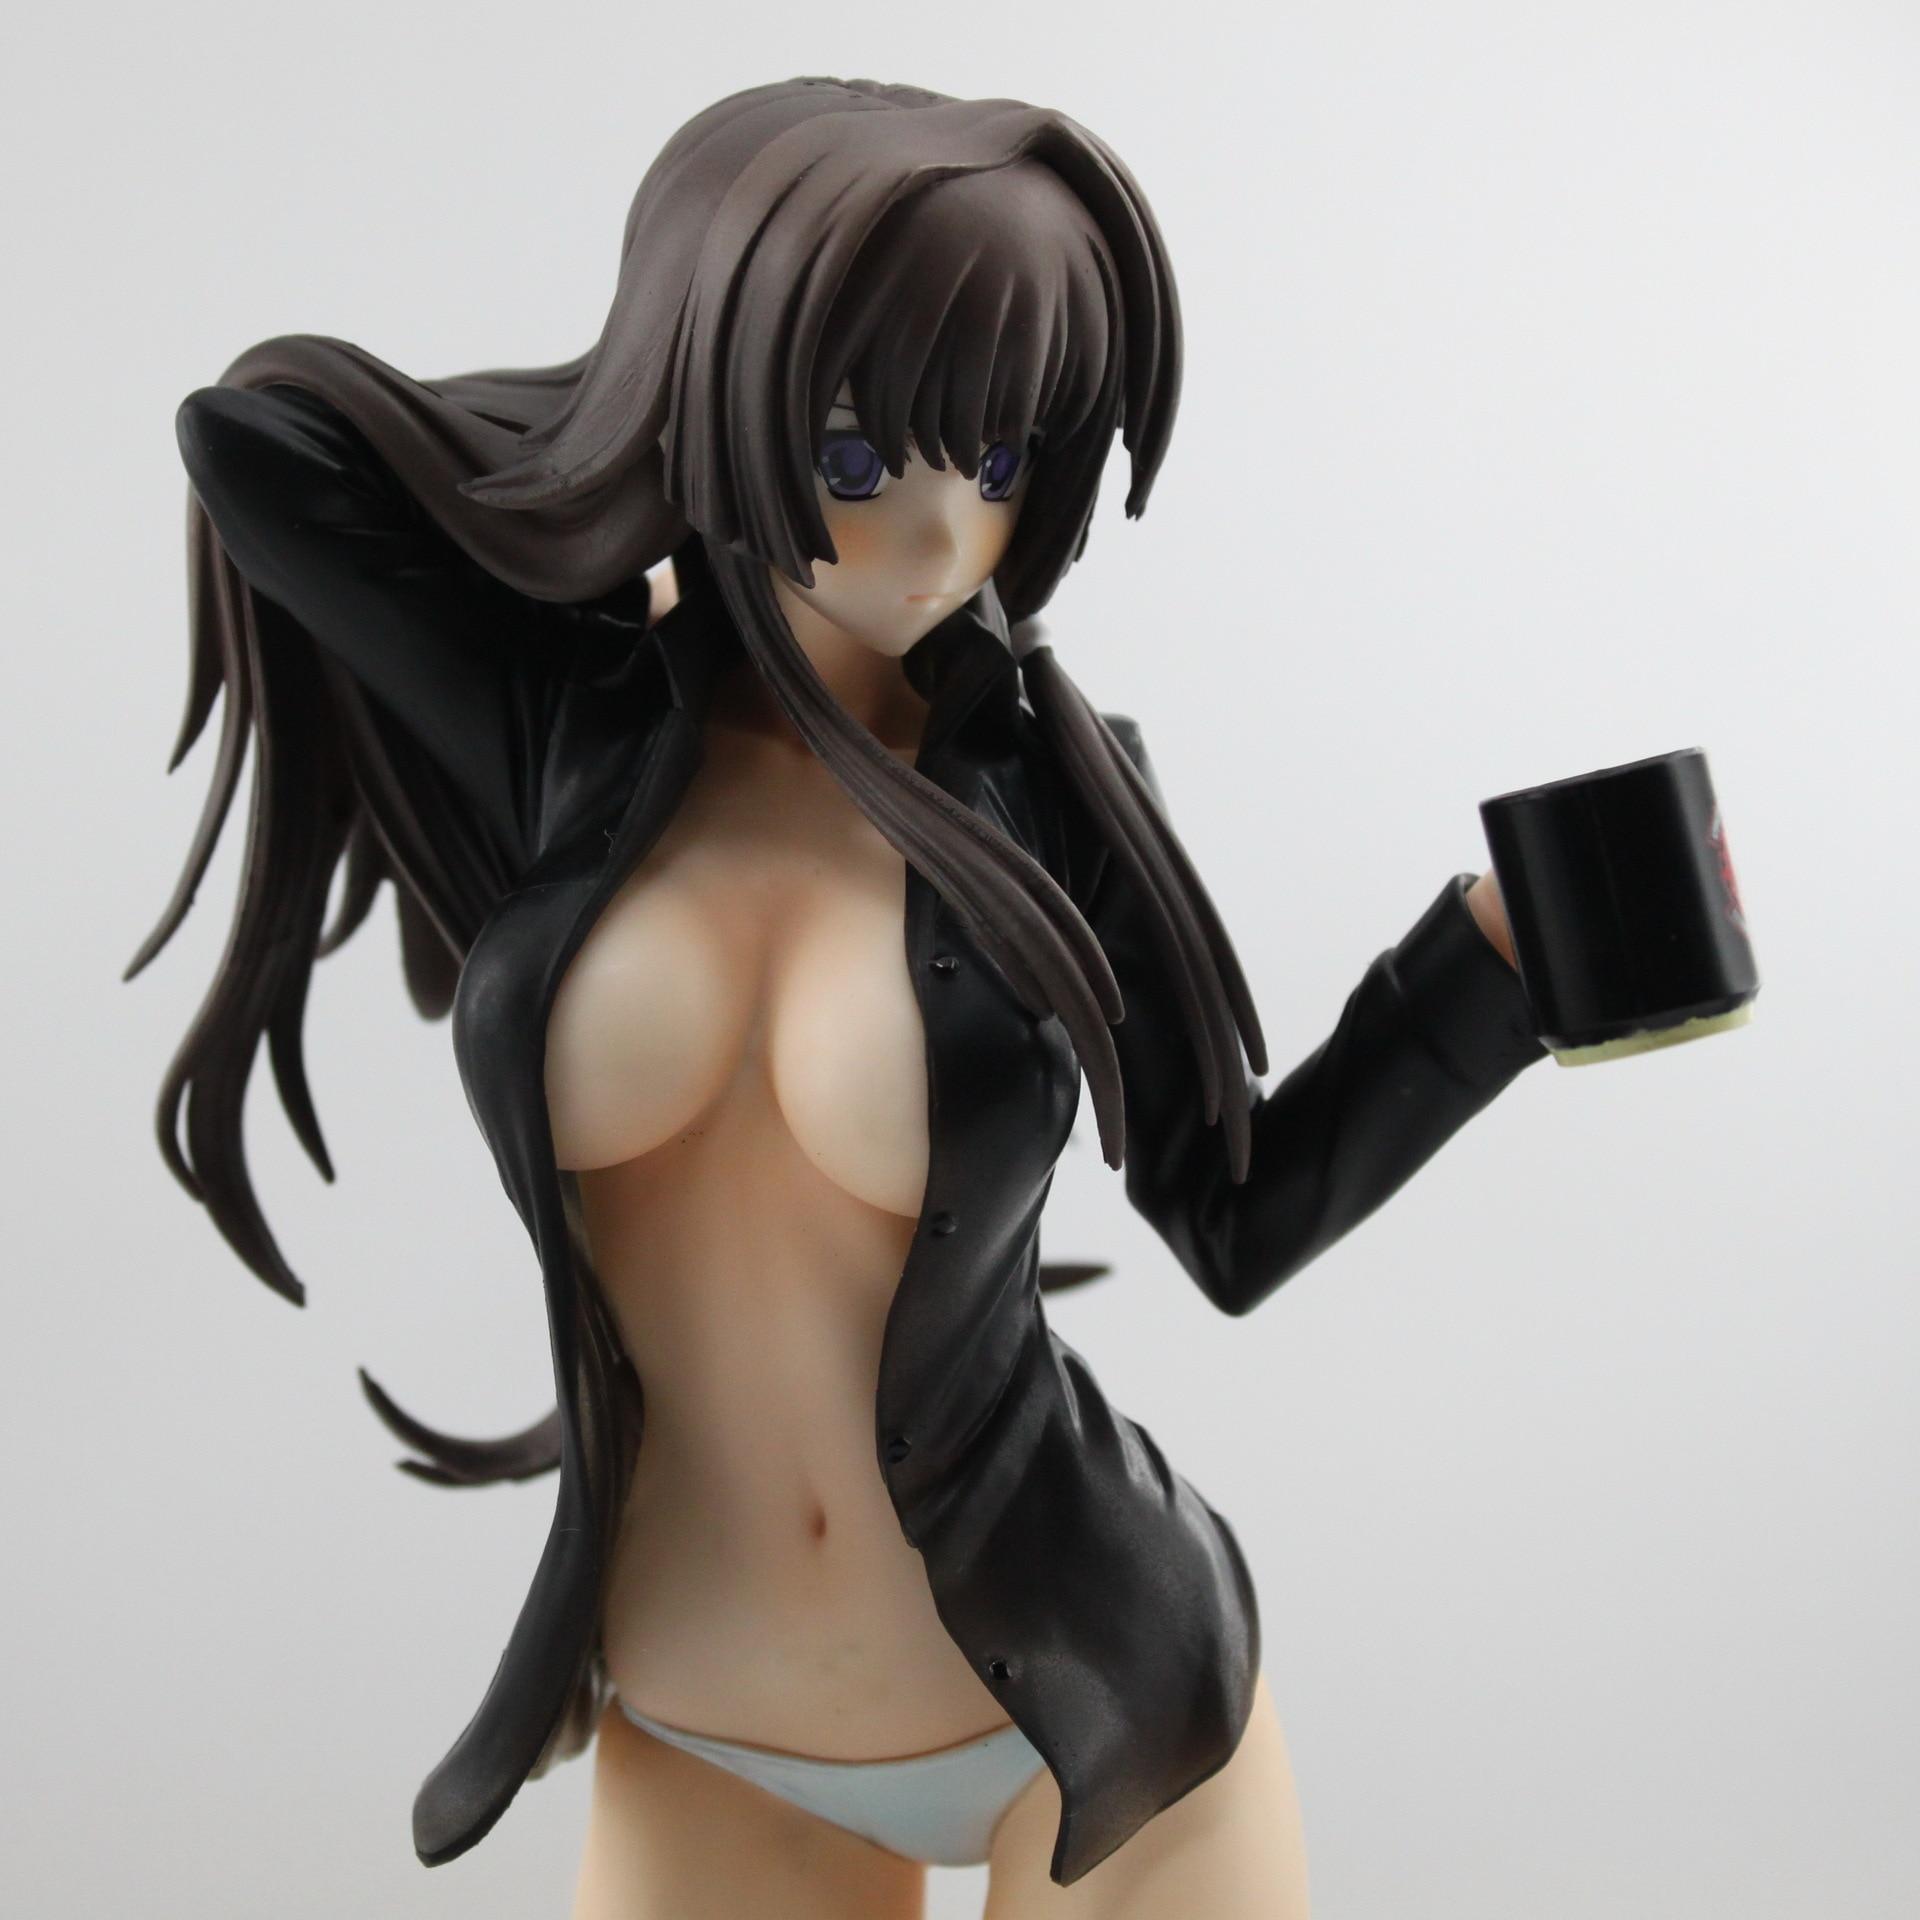 Sexy black anime girls, naruto shippuden girls nude hd